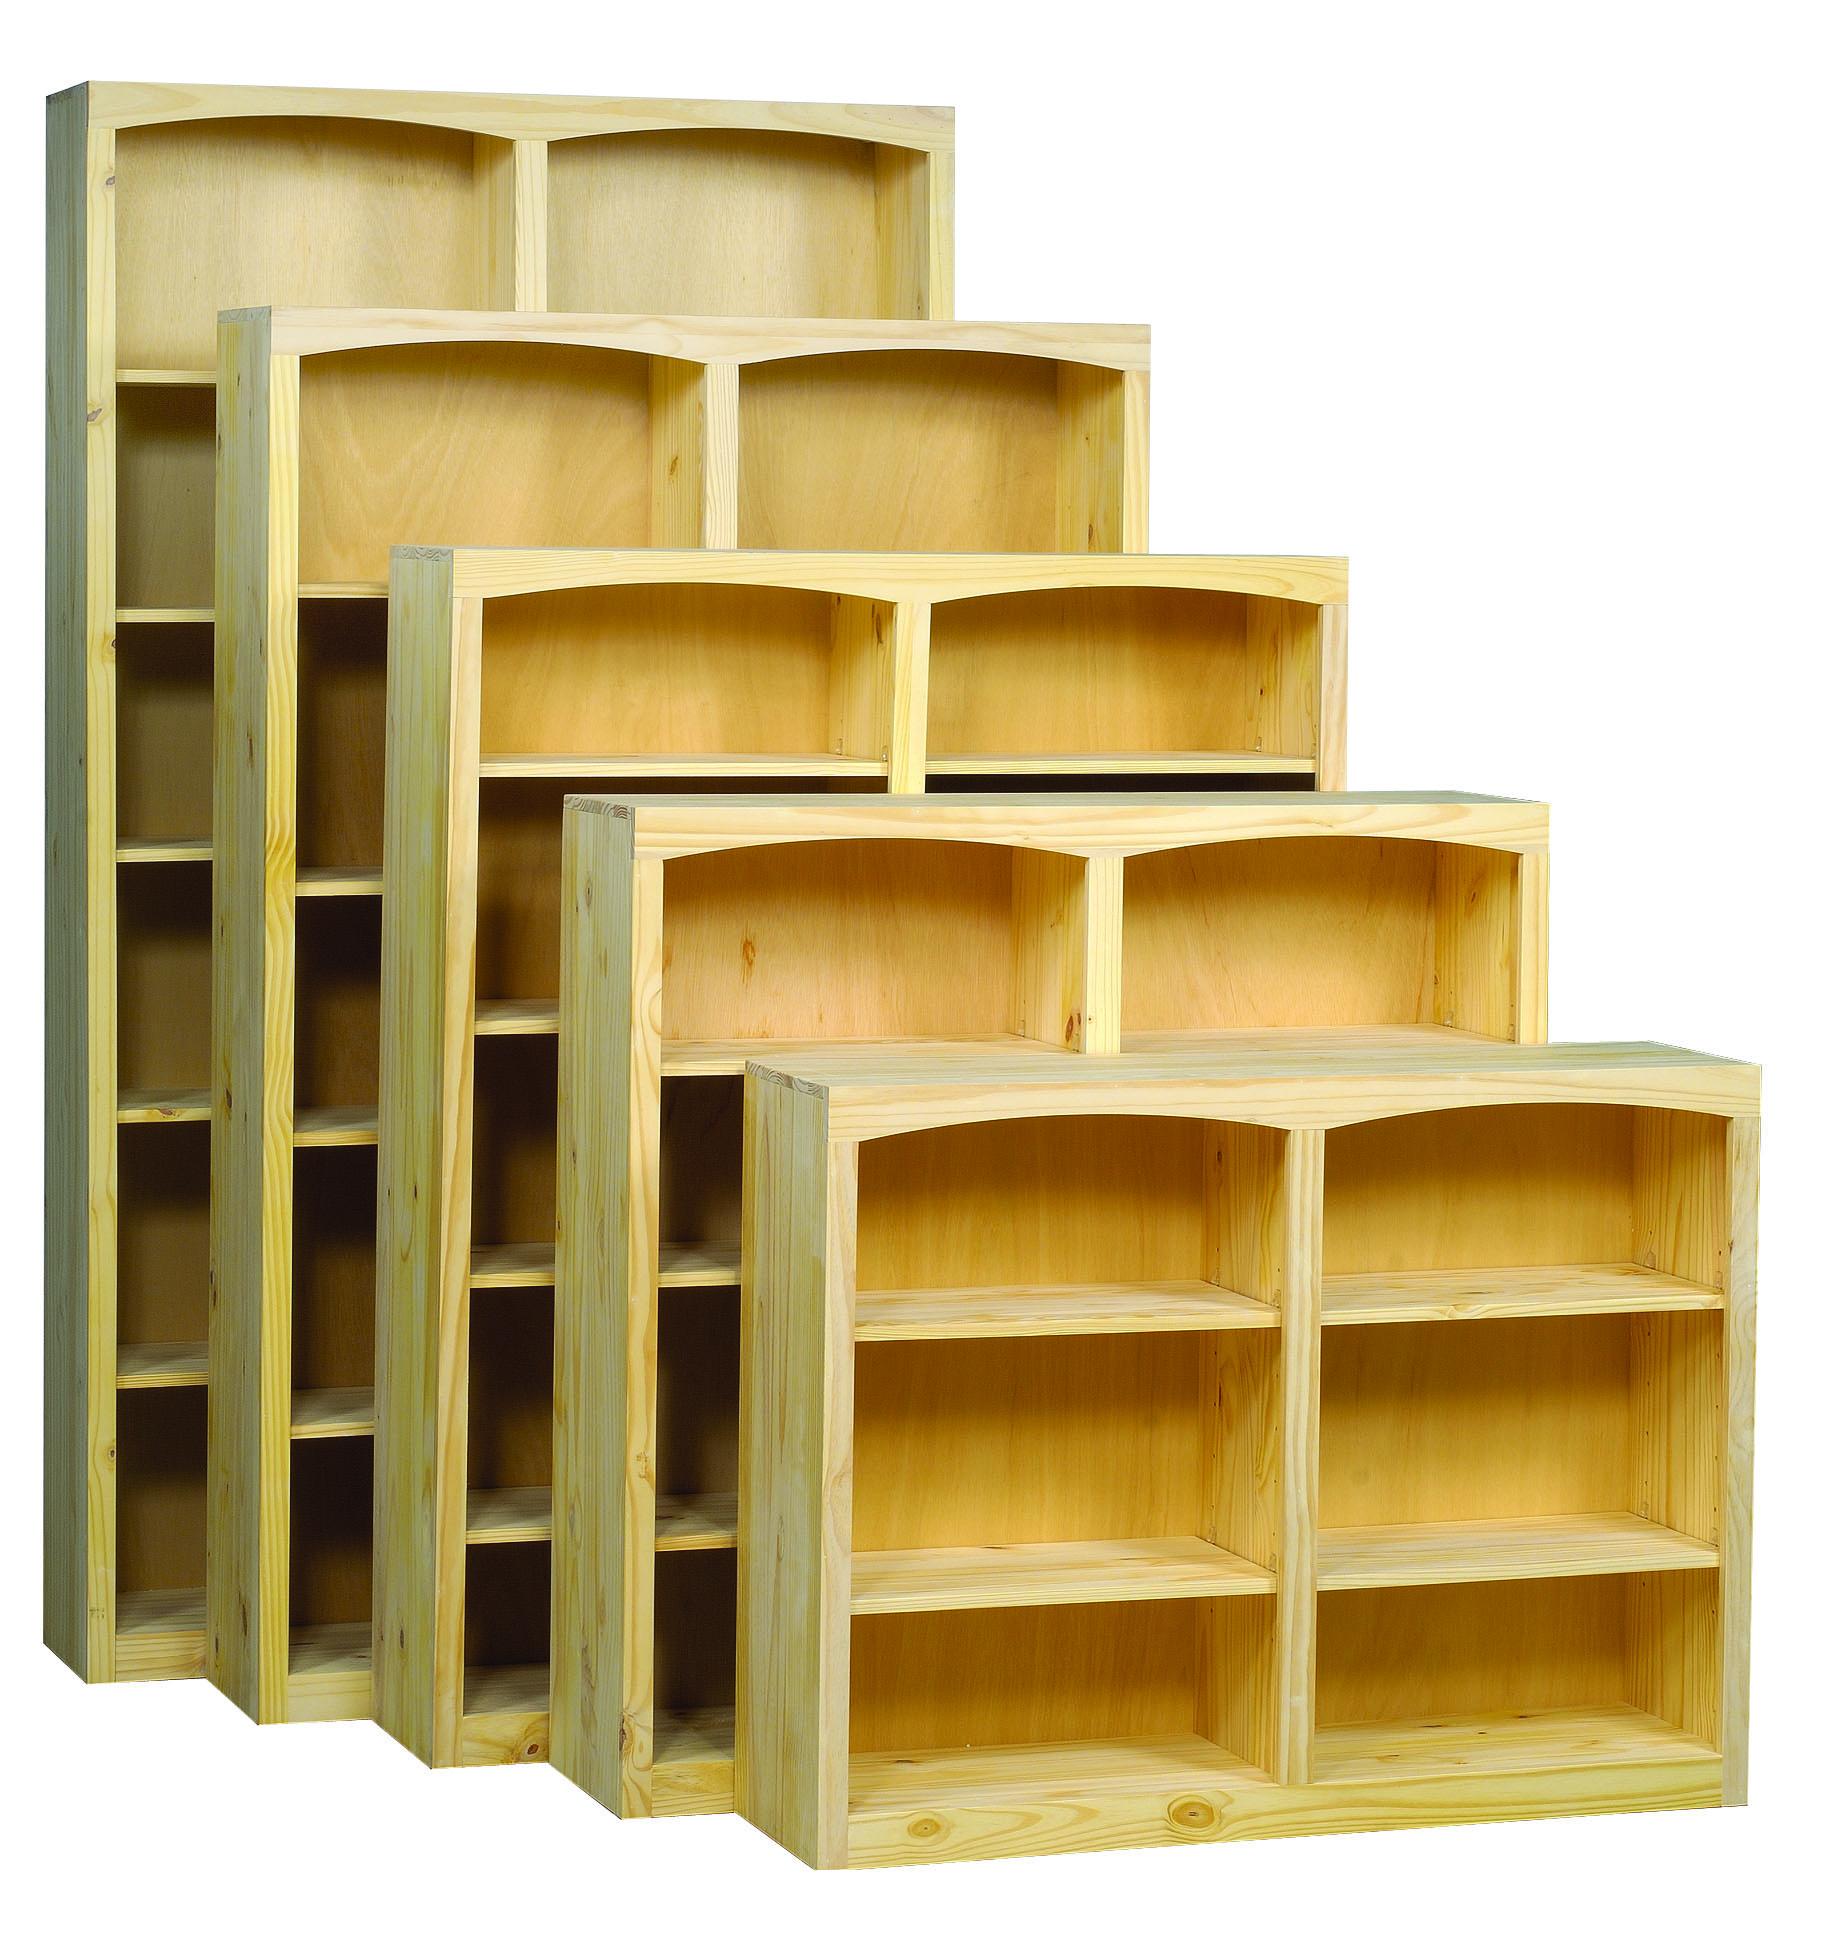 Archbold Furniture 48 Quot Wide Center Divider Pine Bookcase